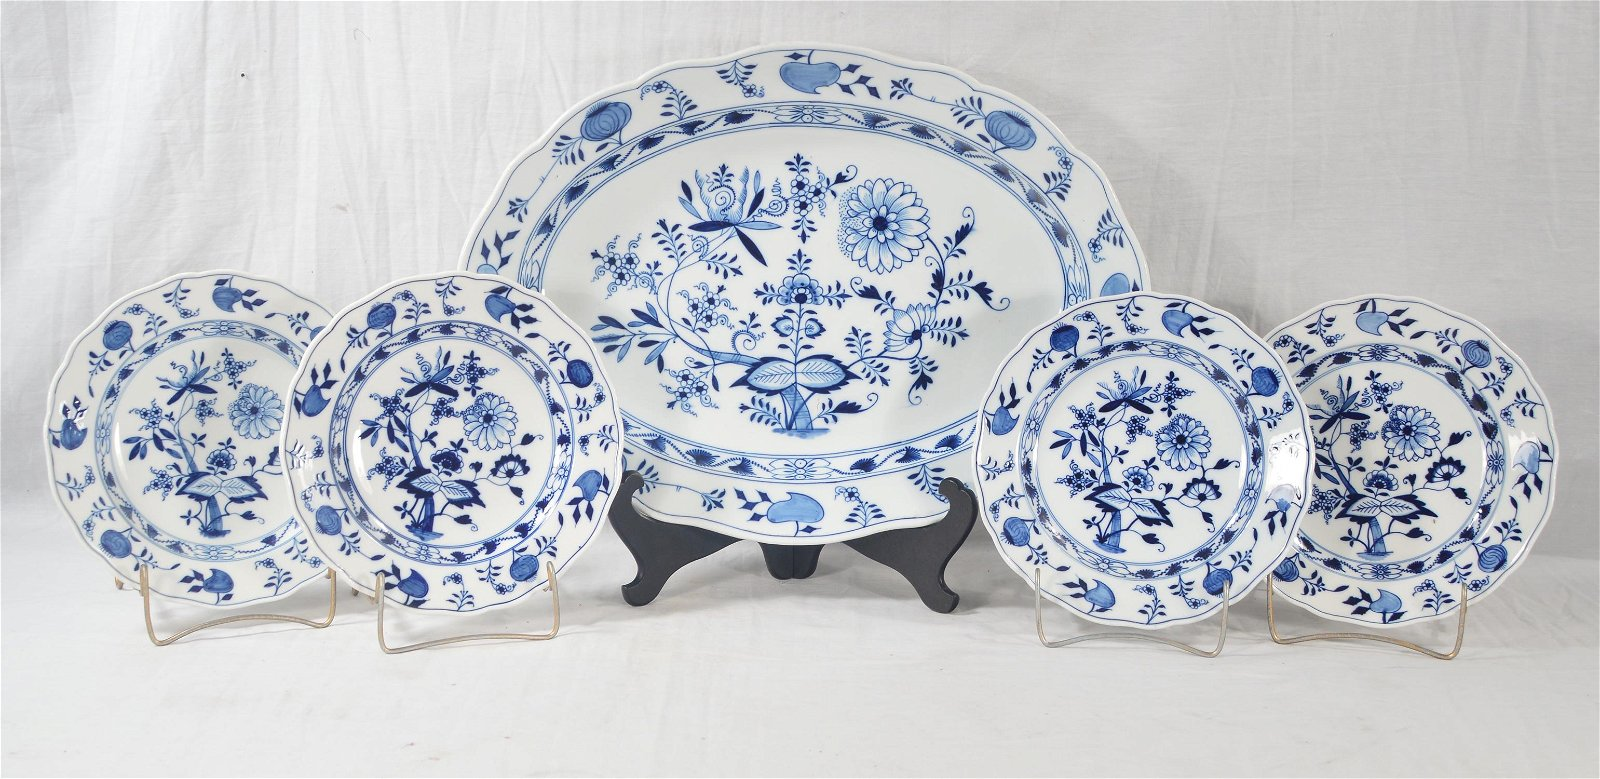 Meissen platter and 4 plates